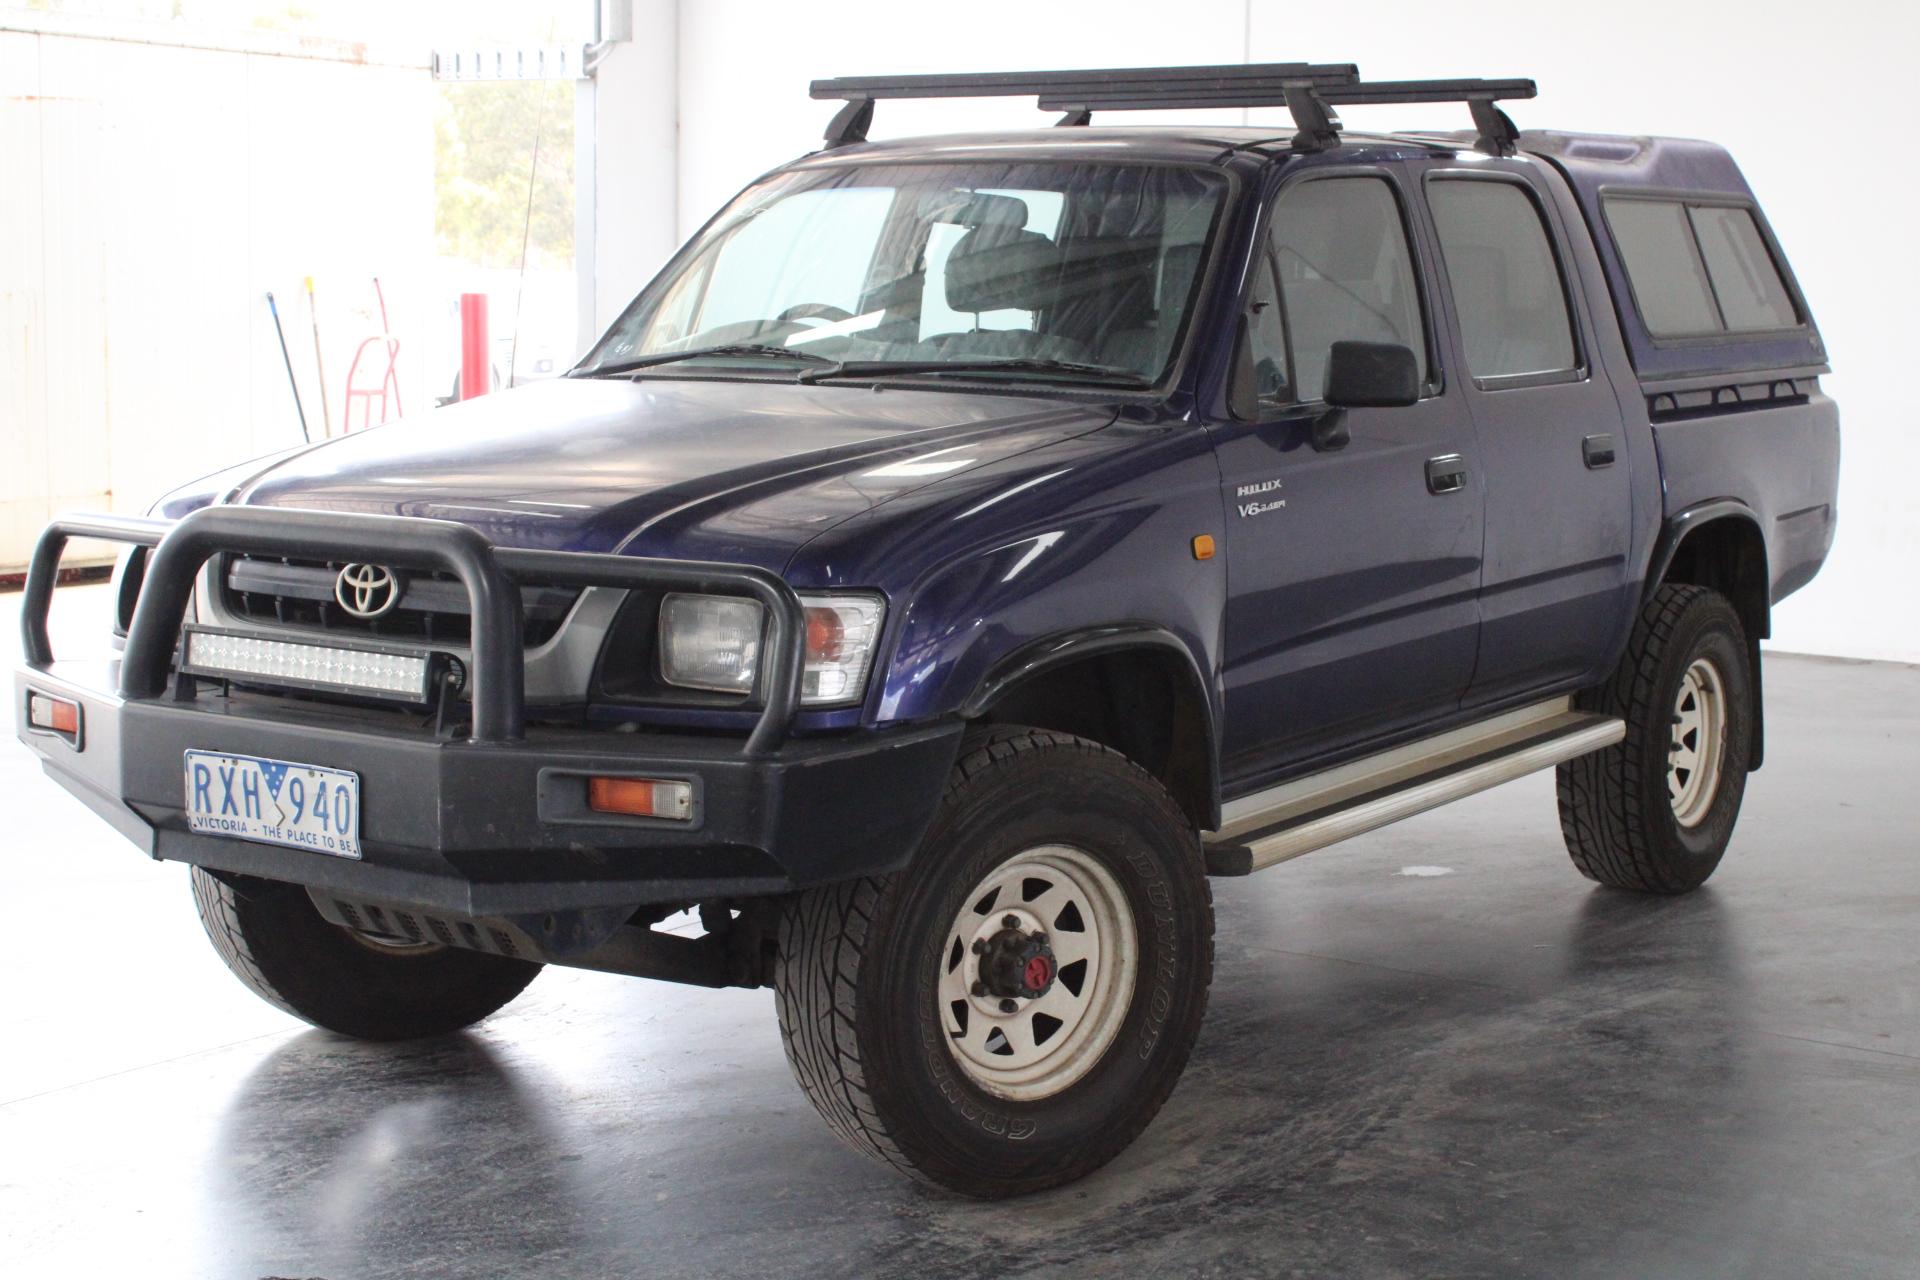 2002 Toyota Hilux (4x4) Manual Dual Cab